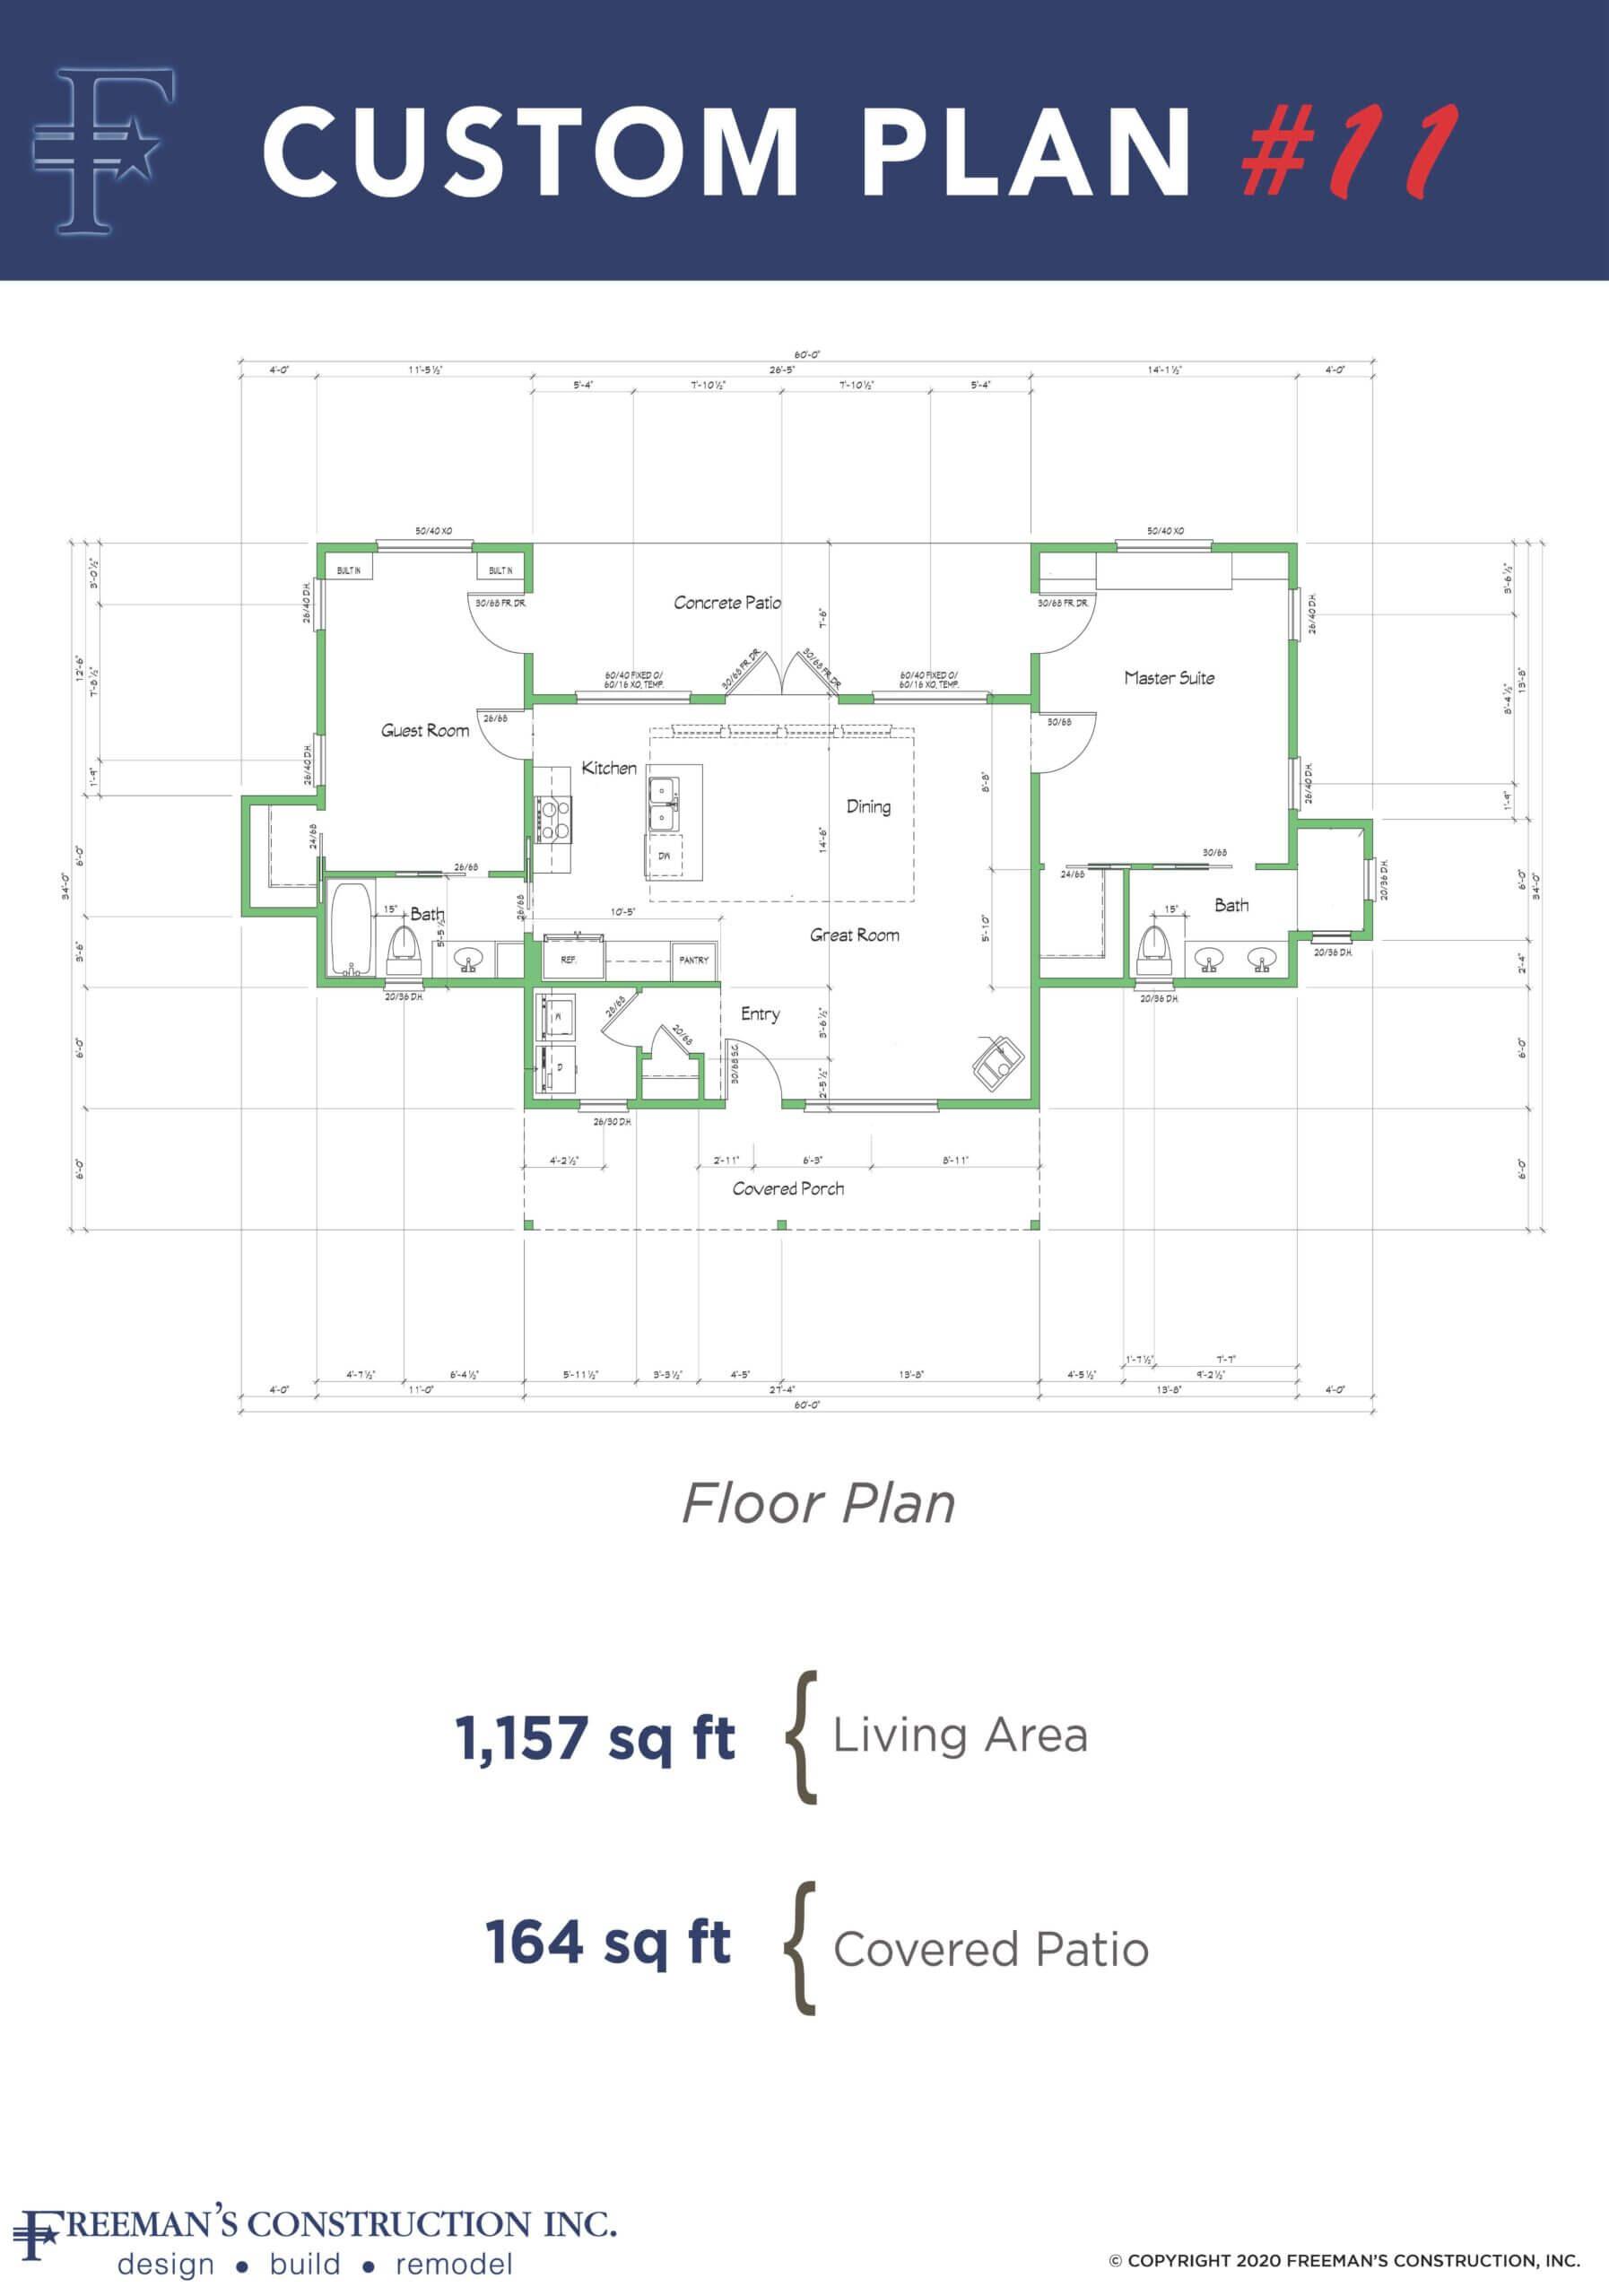 custom-home-floor-plan-11-in-san-diego-county-by-freemans-construction-inc